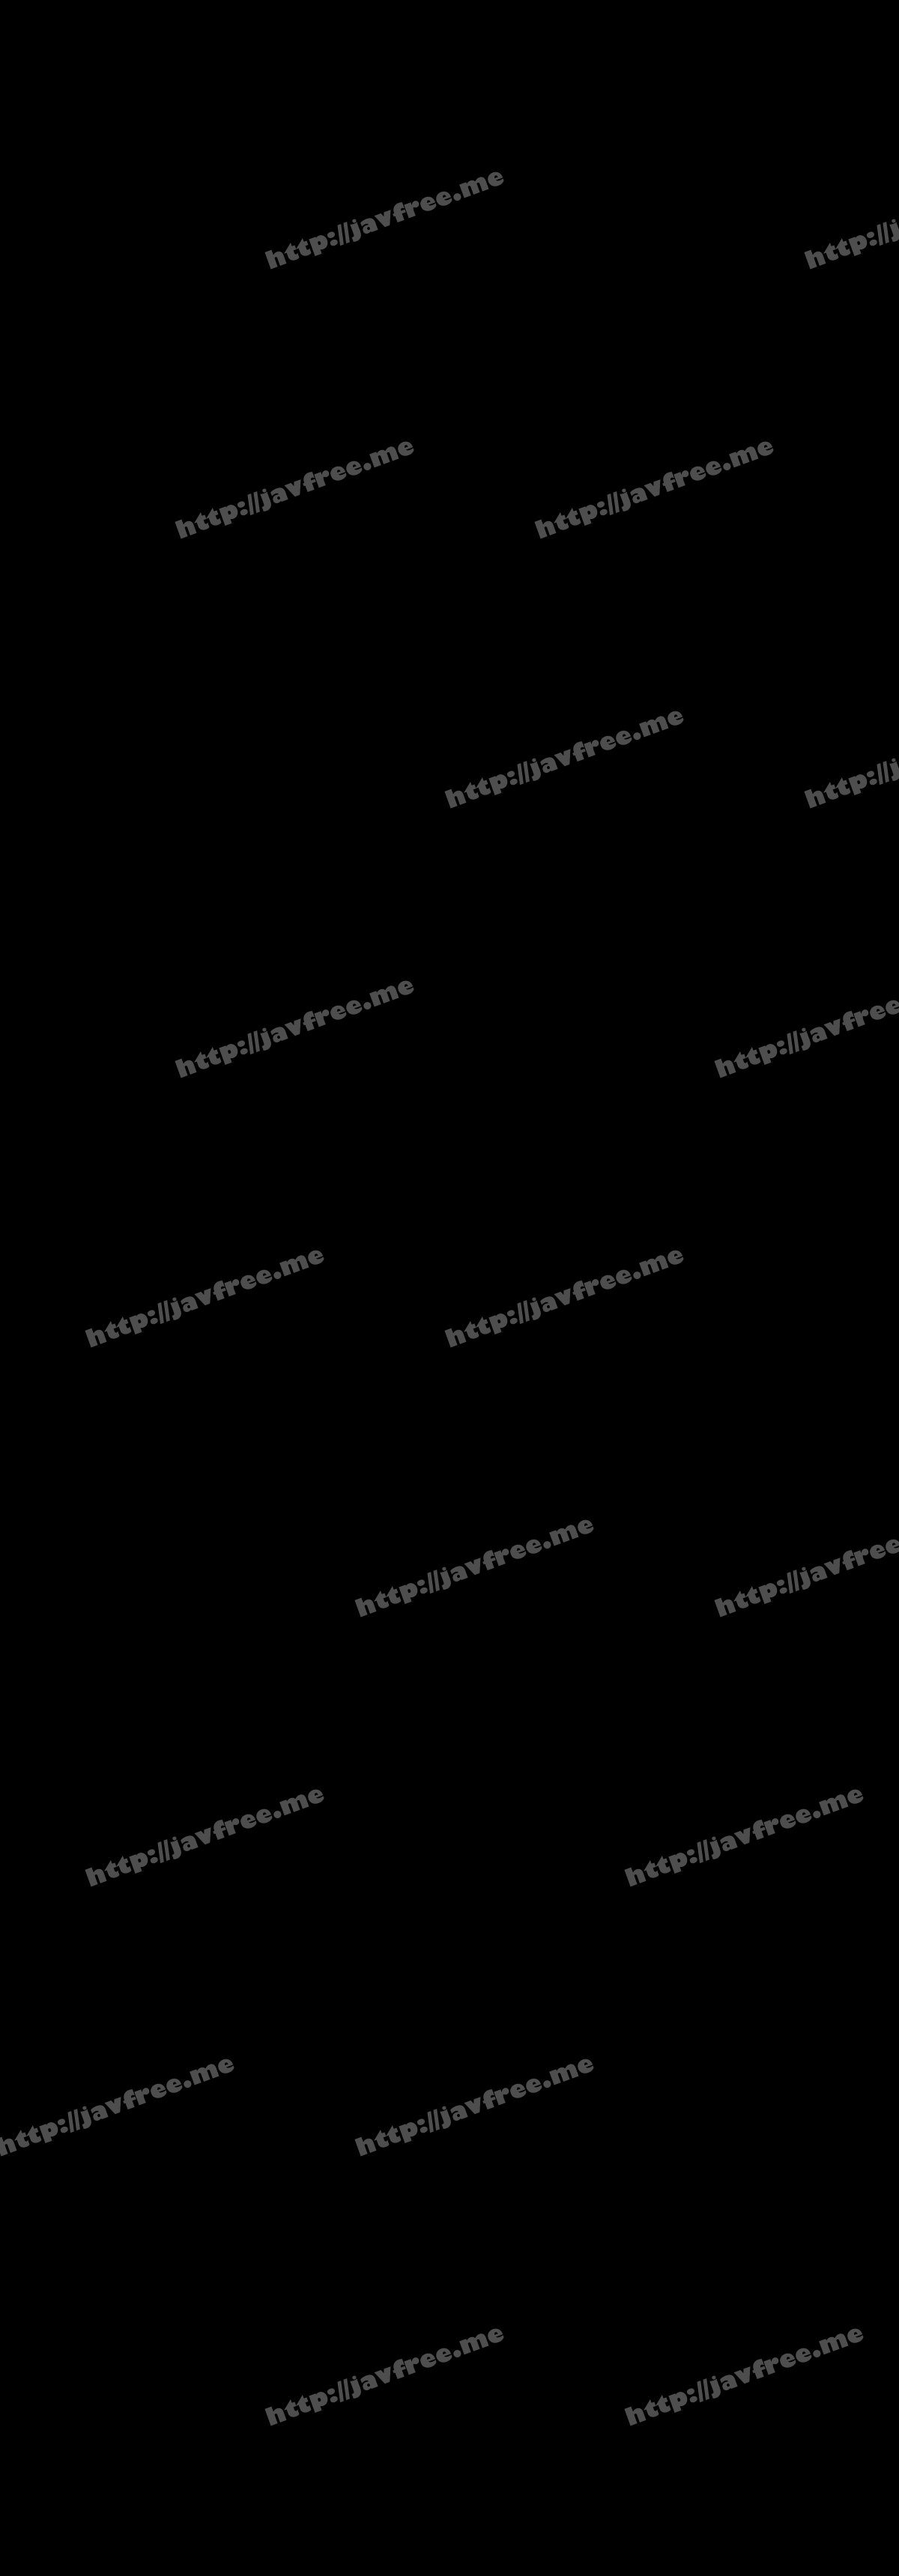 [HD][SALO-002] 美鈴女王様の調教部屋 川菜美鈴 - image MIDE-673-1080p on https://javfree.me